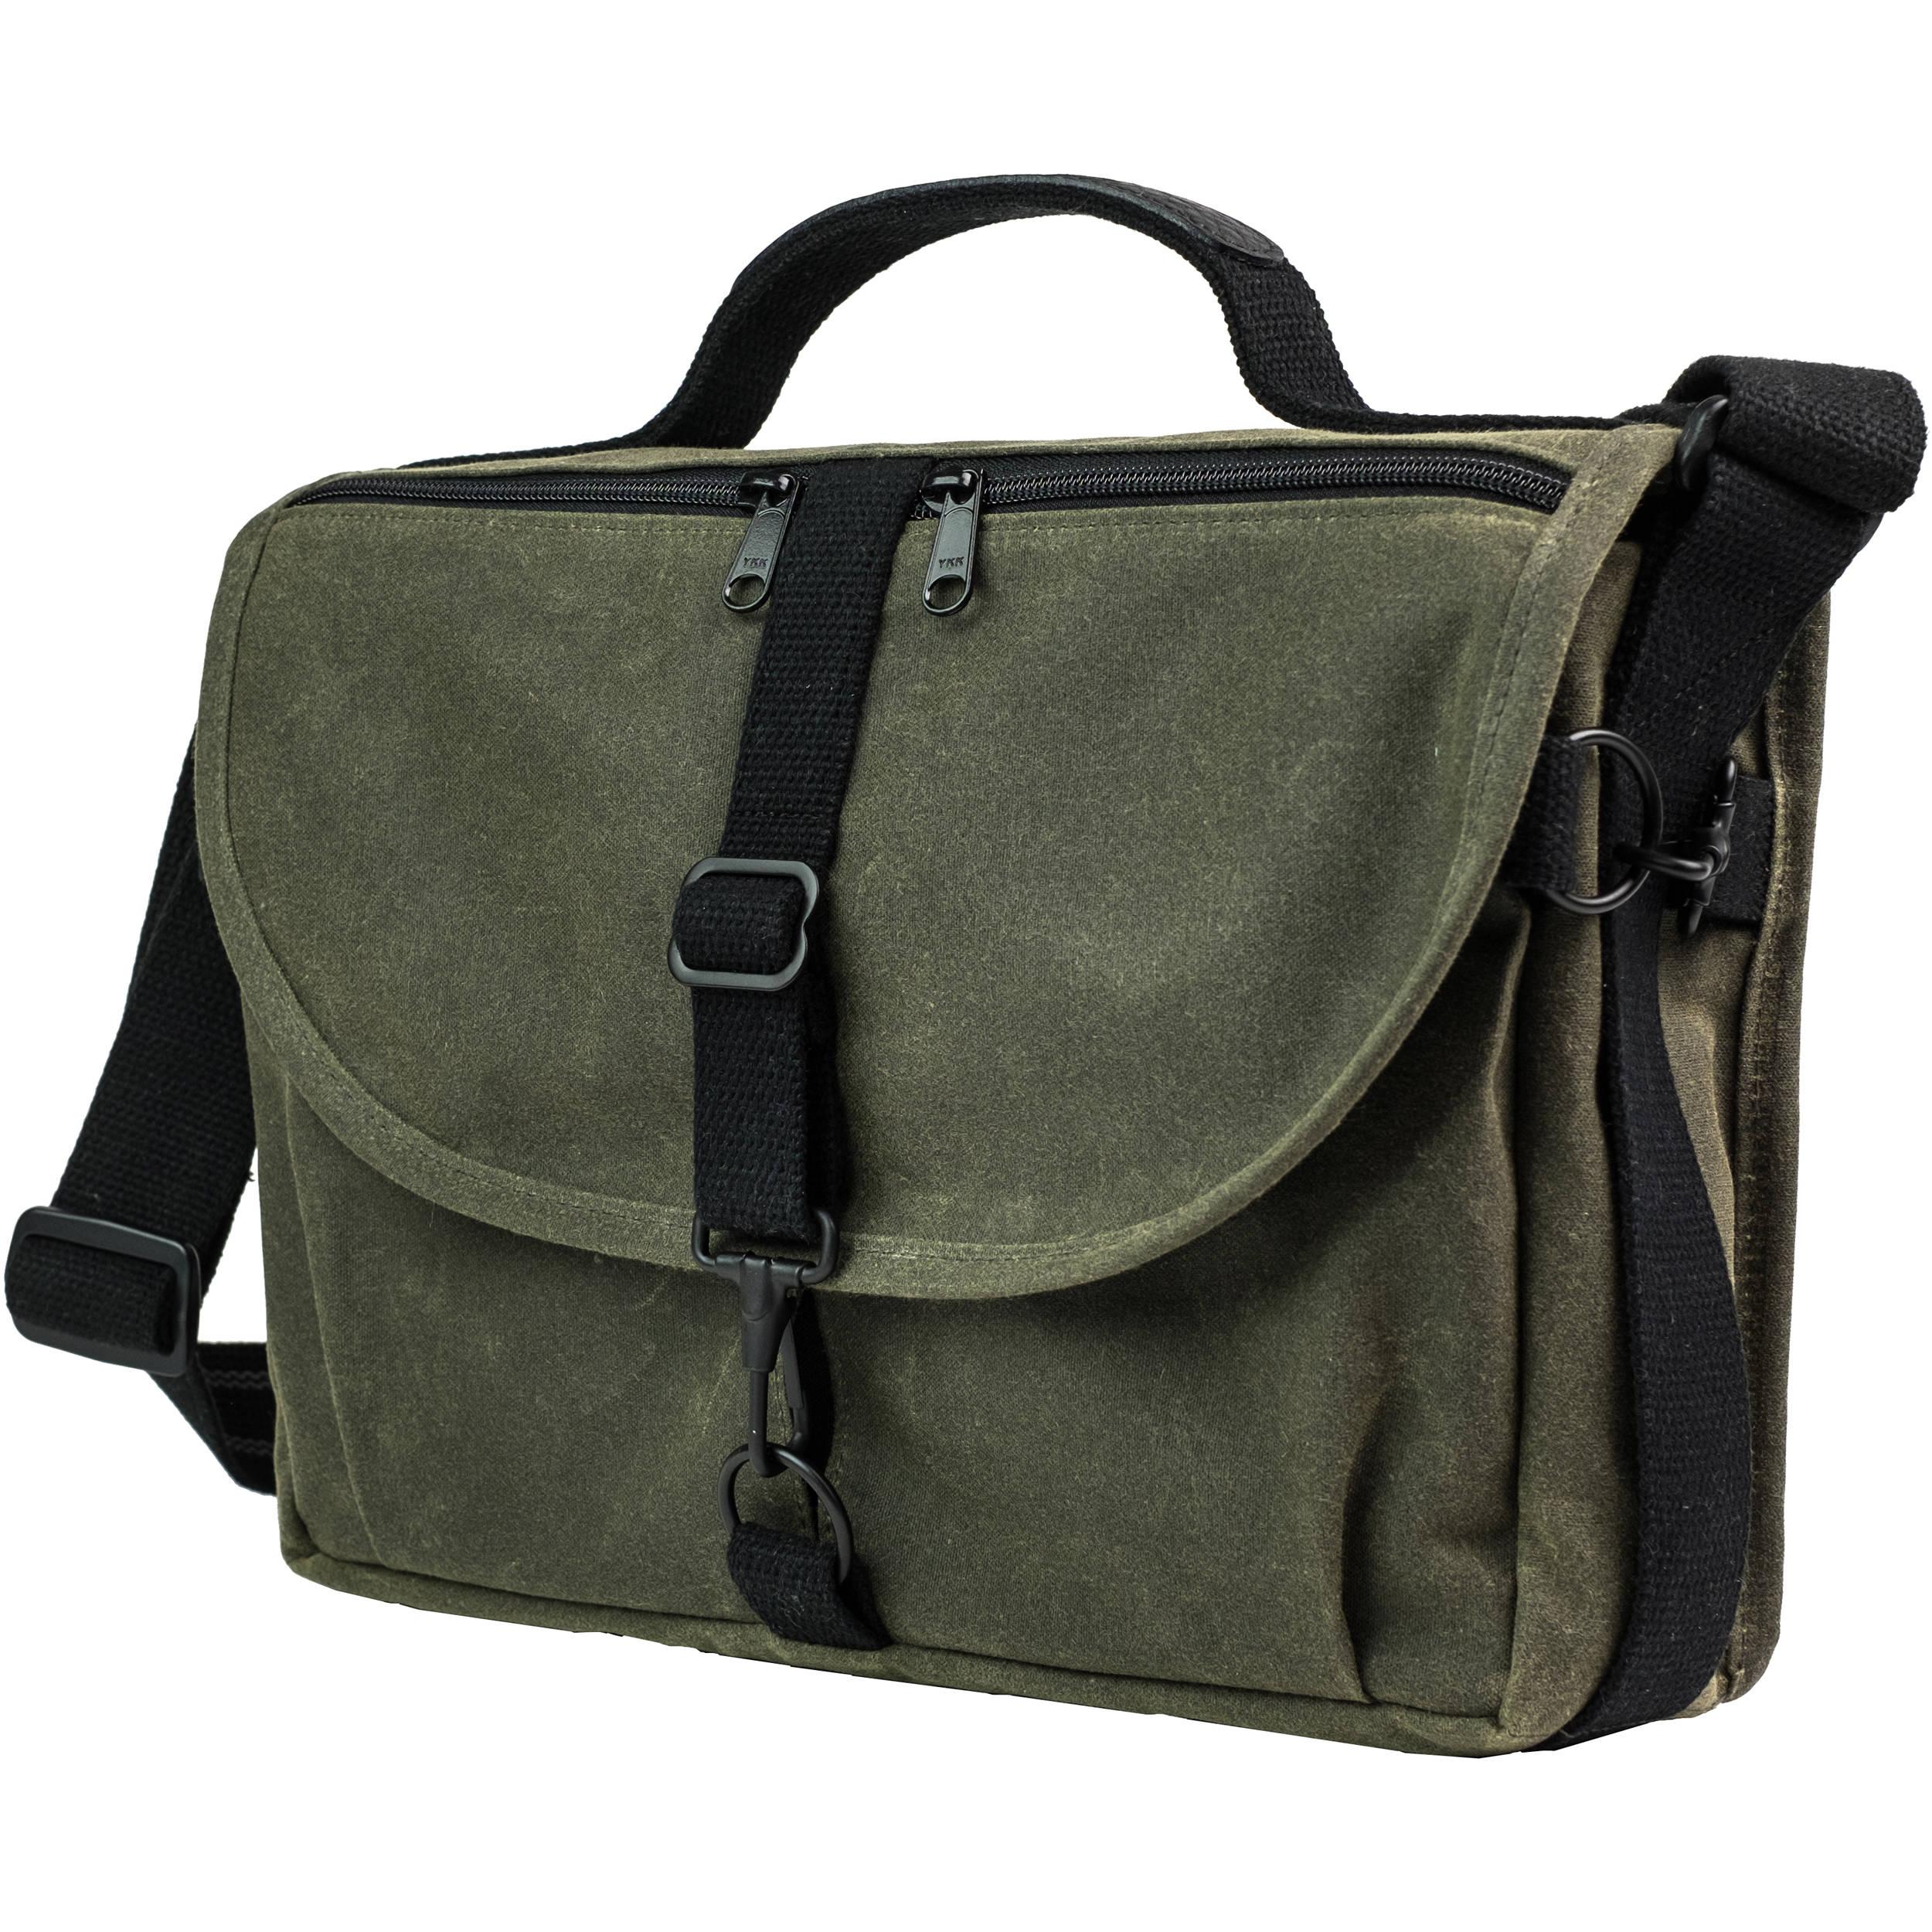 Domke F 803 Ruggedwear Messenger Bag Military Green